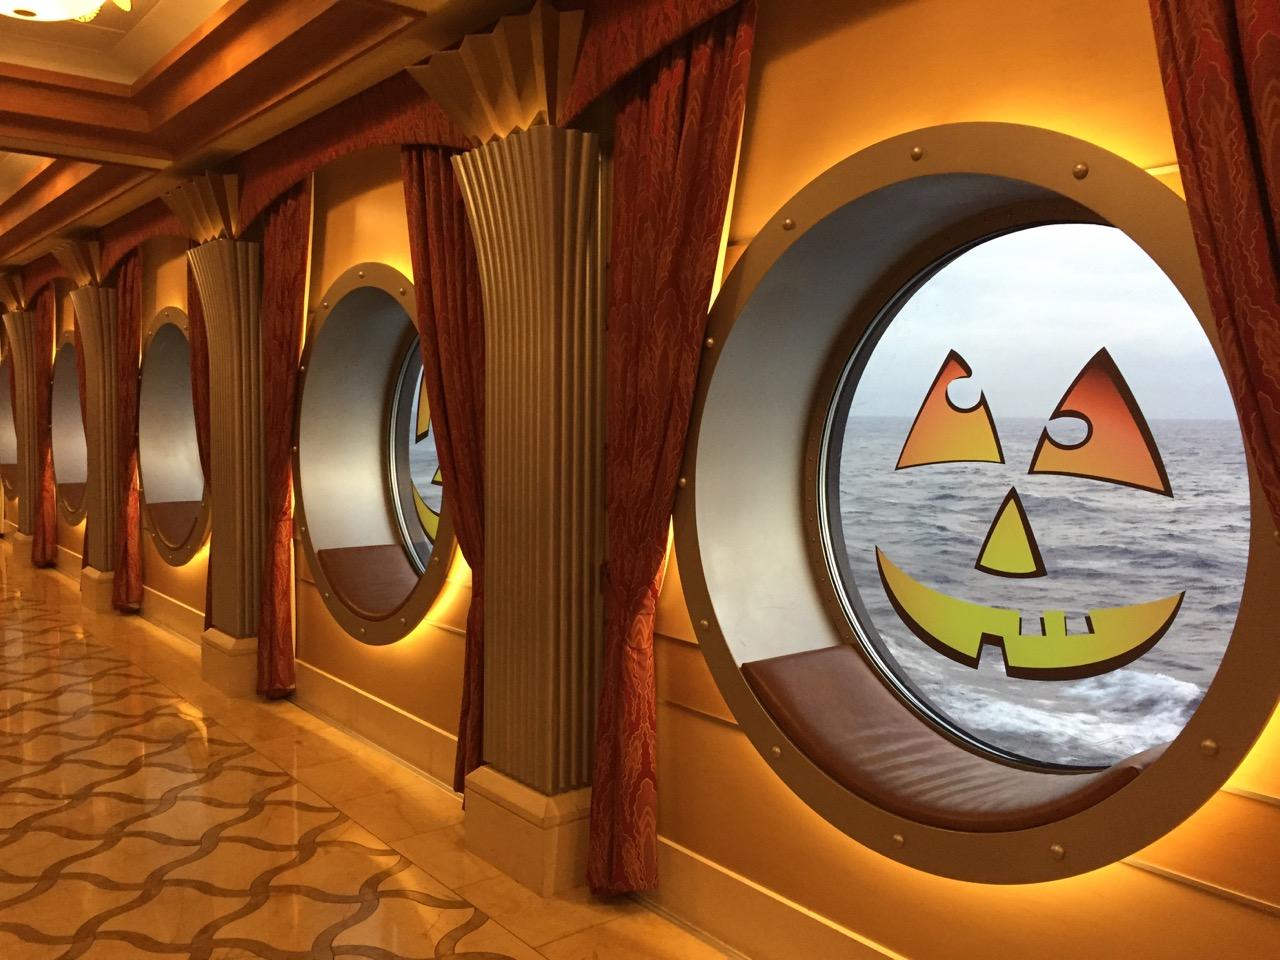 Disney Dream Halloween on the High Seas Decorations